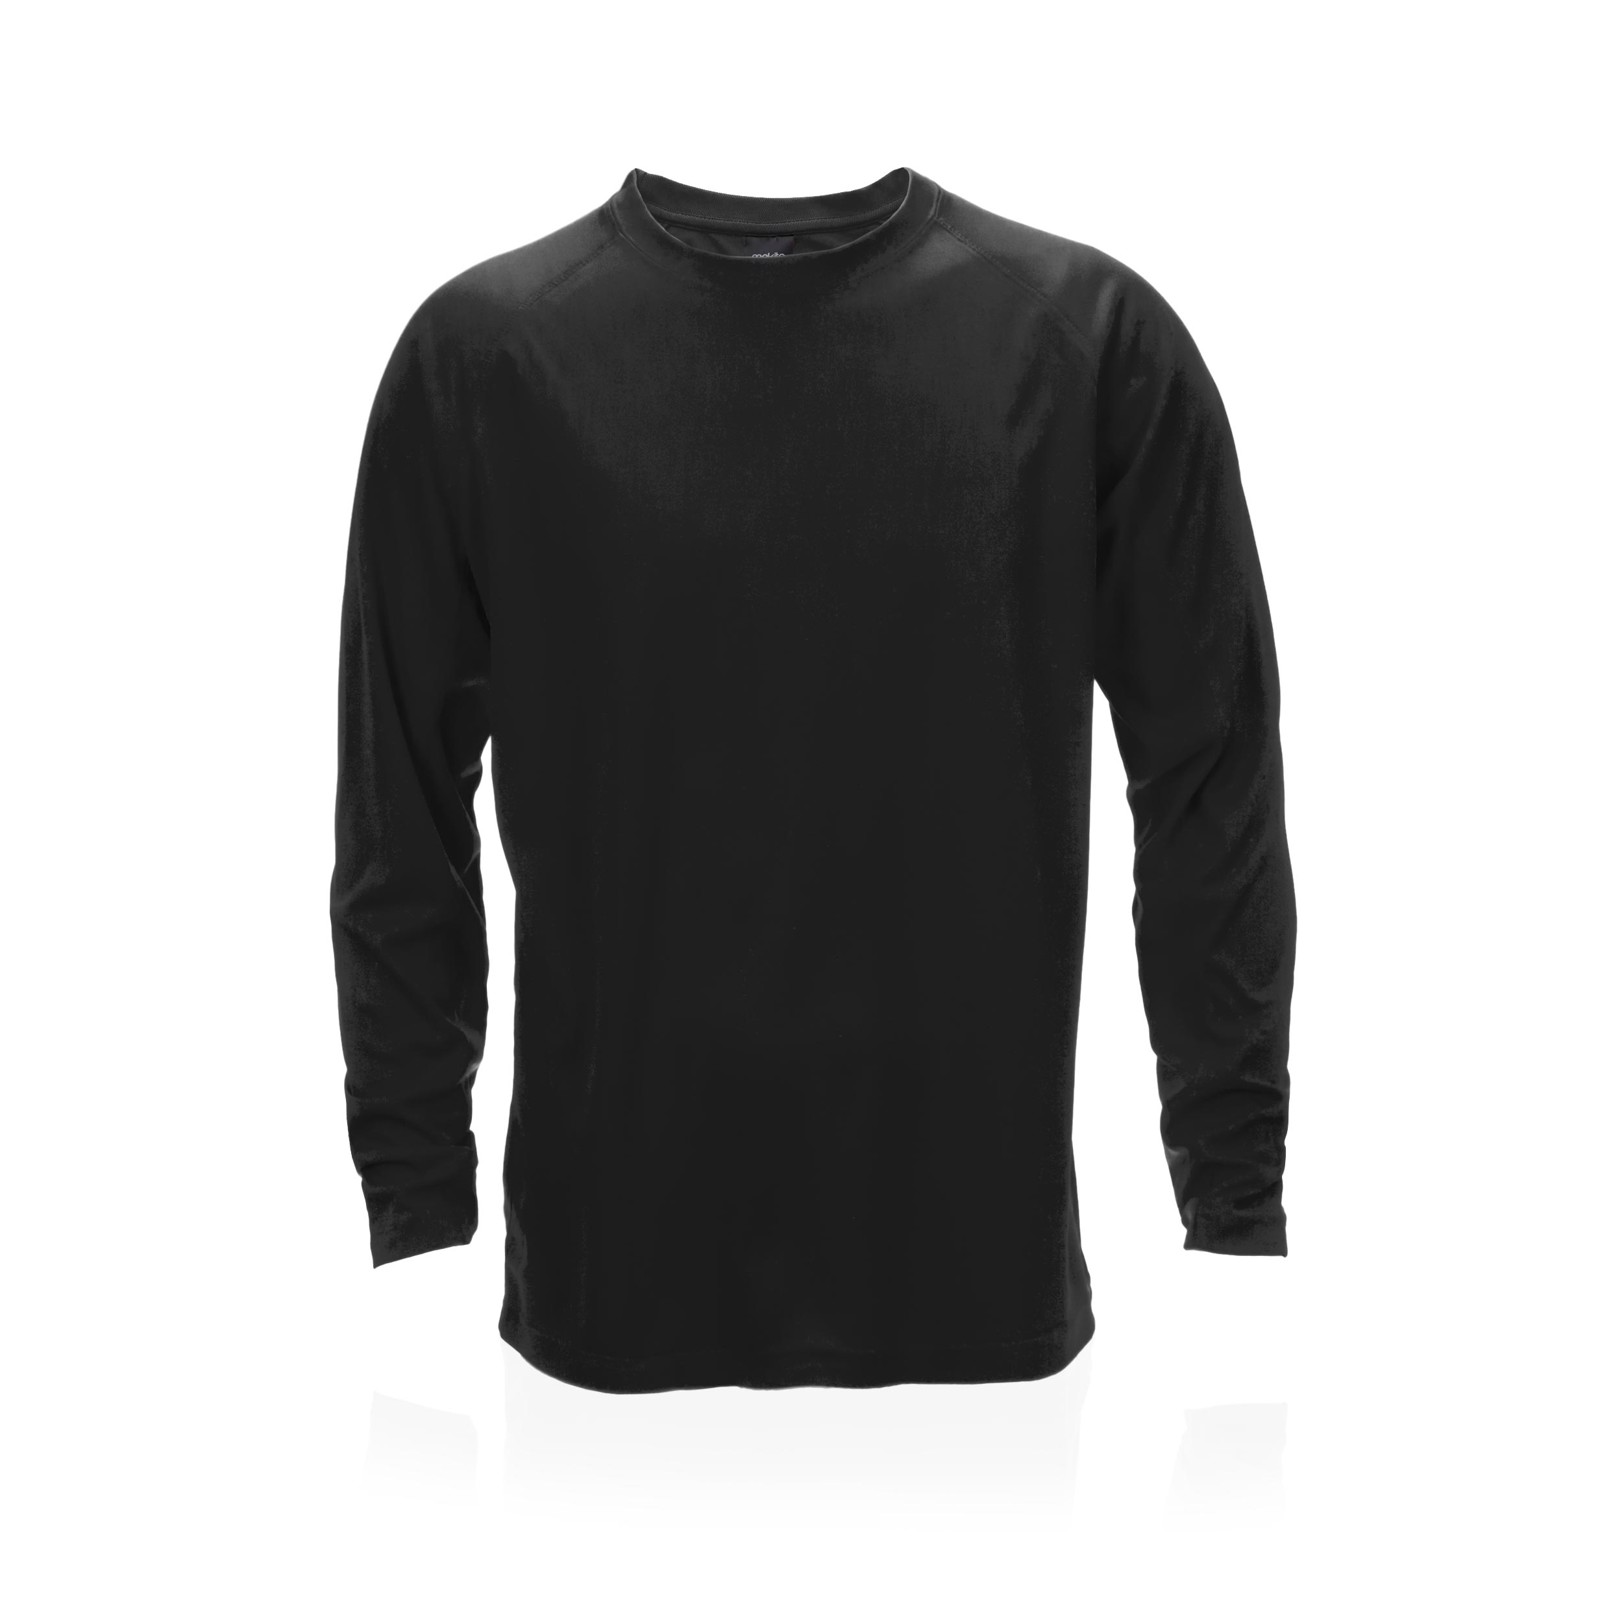 Camiseta Adulto Tecnik Maik - Negro / M